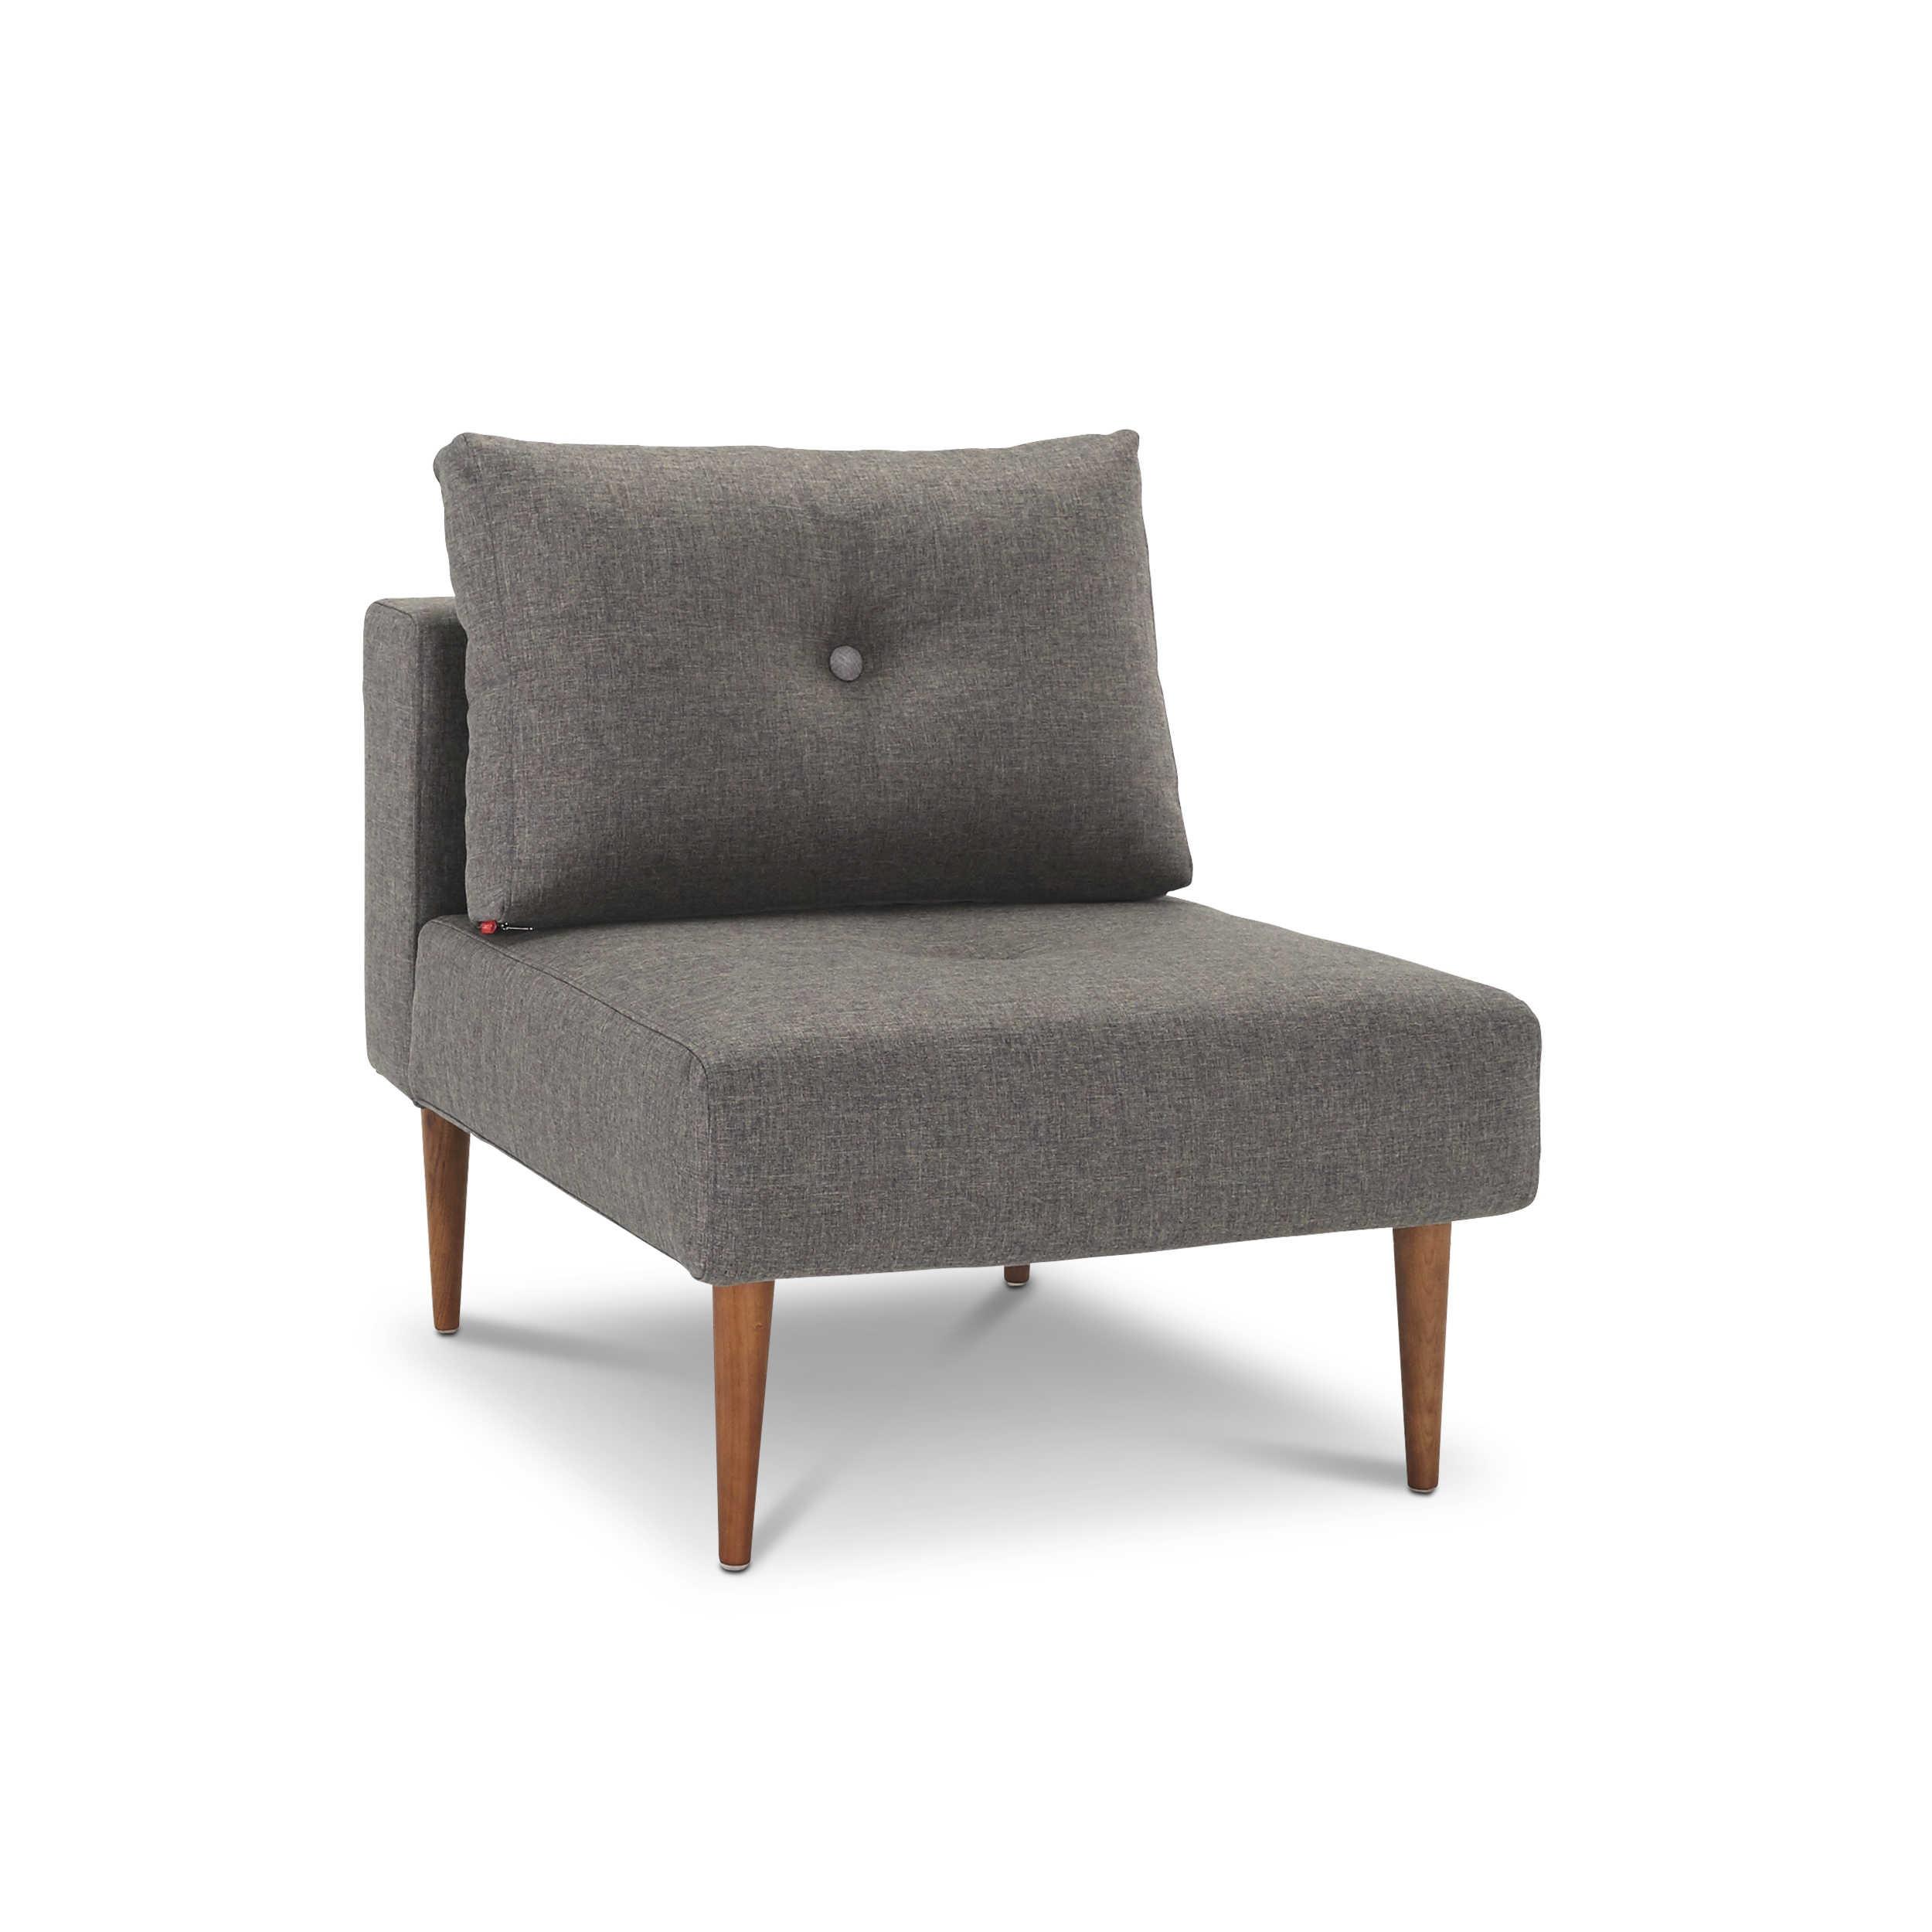 innovation sessel recast grau stoff online kaufen bei woonio. Black Bedroom Furniture Sets. Home Design Ideas